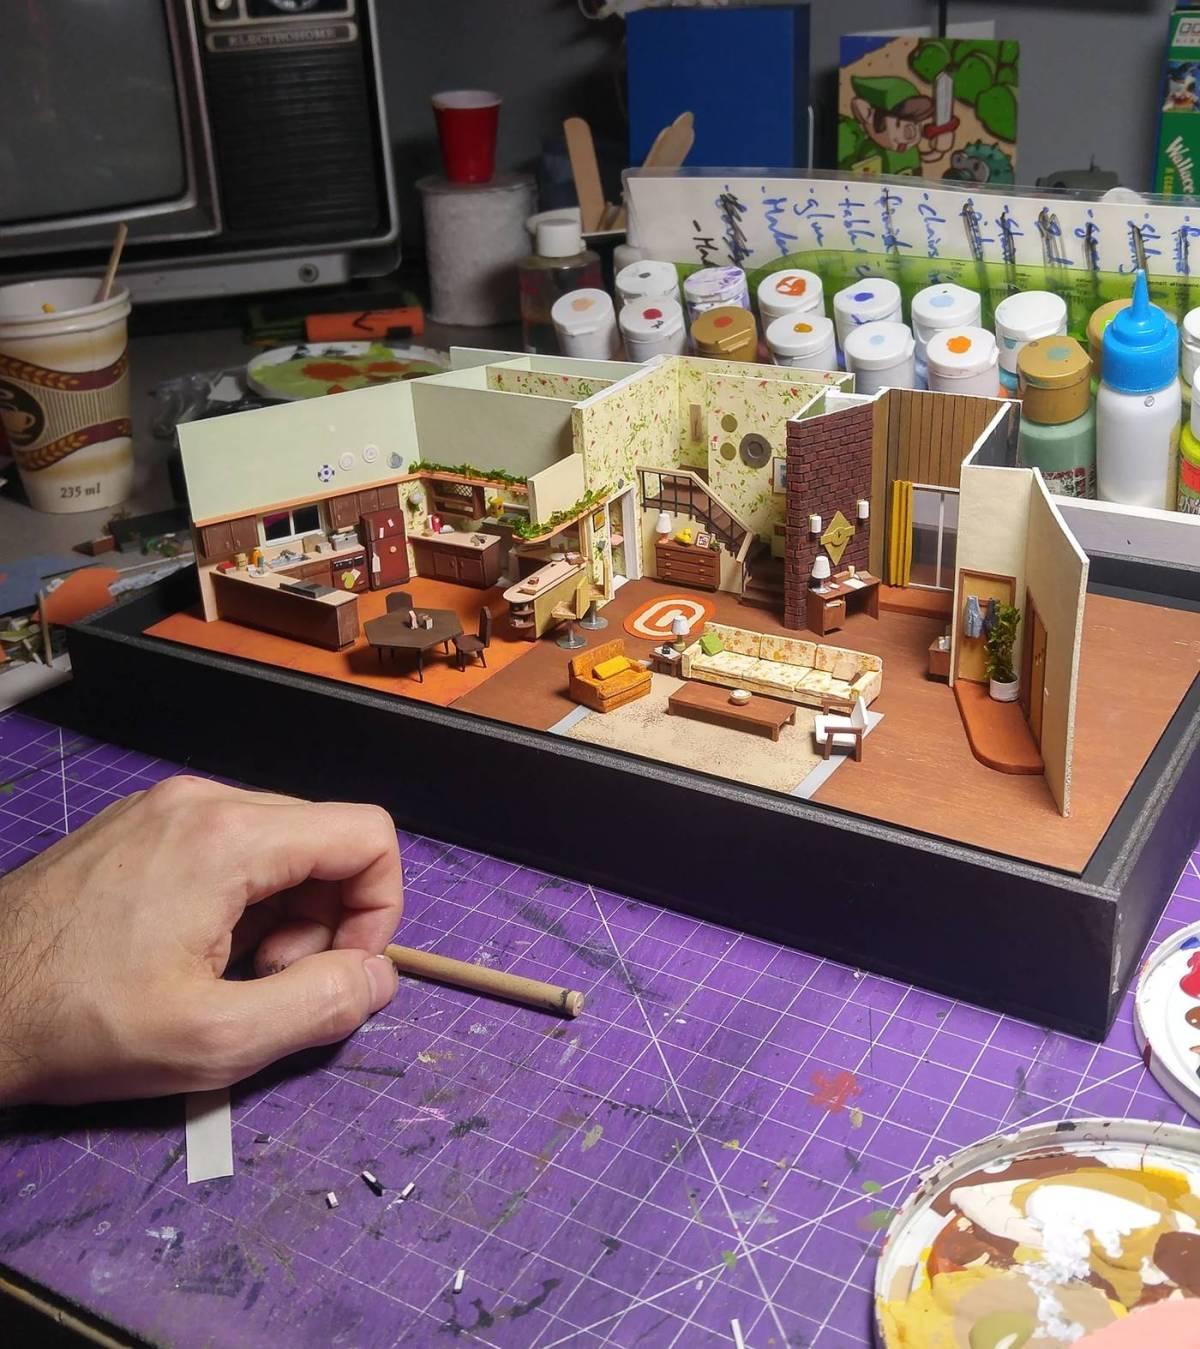 Model Maker Displays A Remarkable Eye For Detail In Making Adorable Miniature Models 1